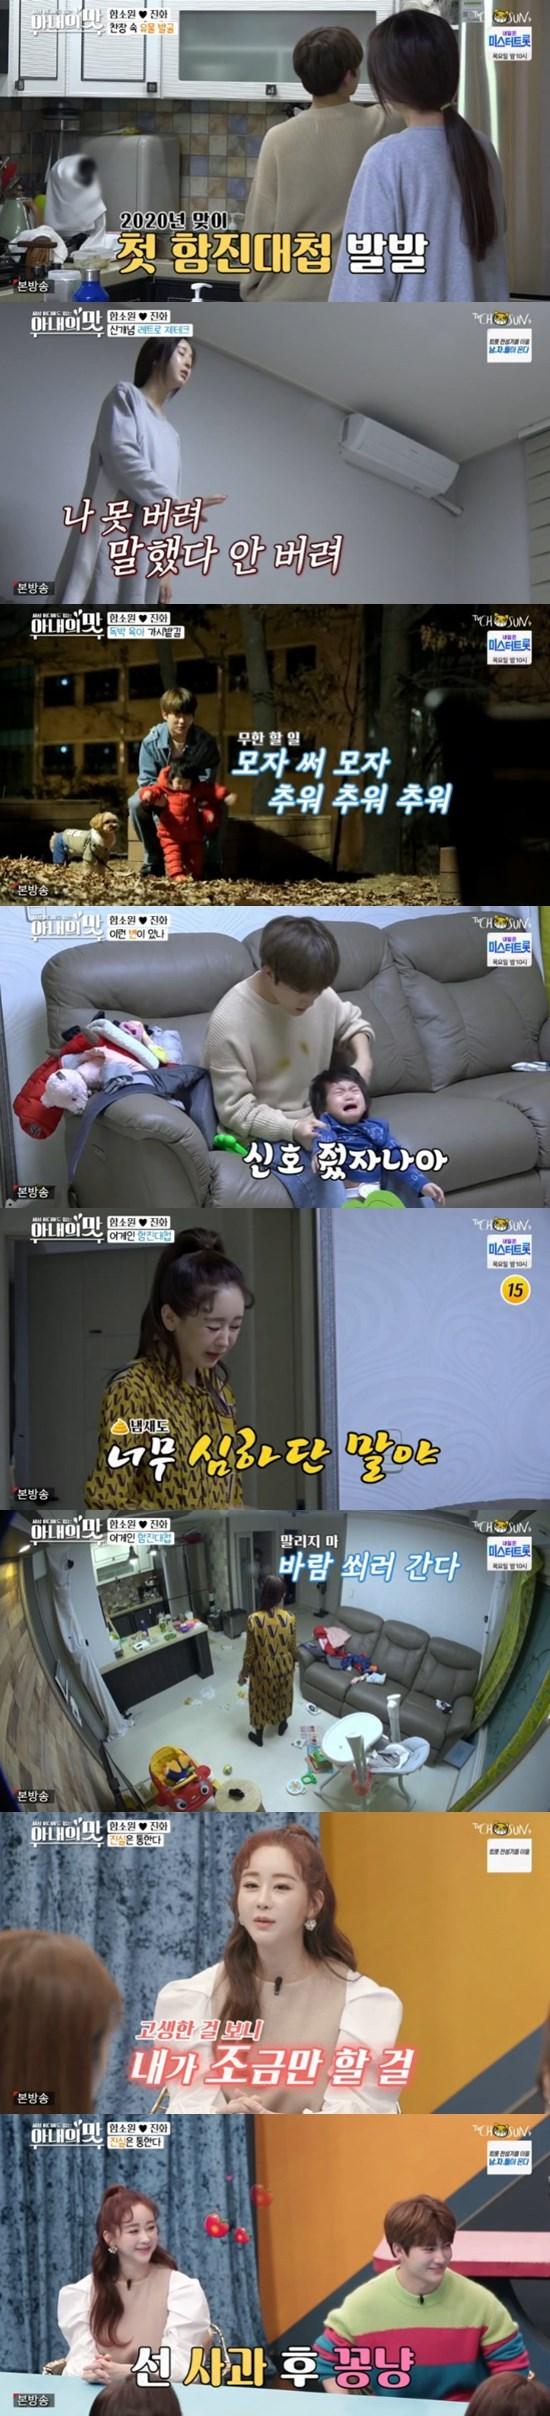 [RE:TV] '아내의 맛' 진화, 함소원과 갈등으로 가출…첩첩산중 육아